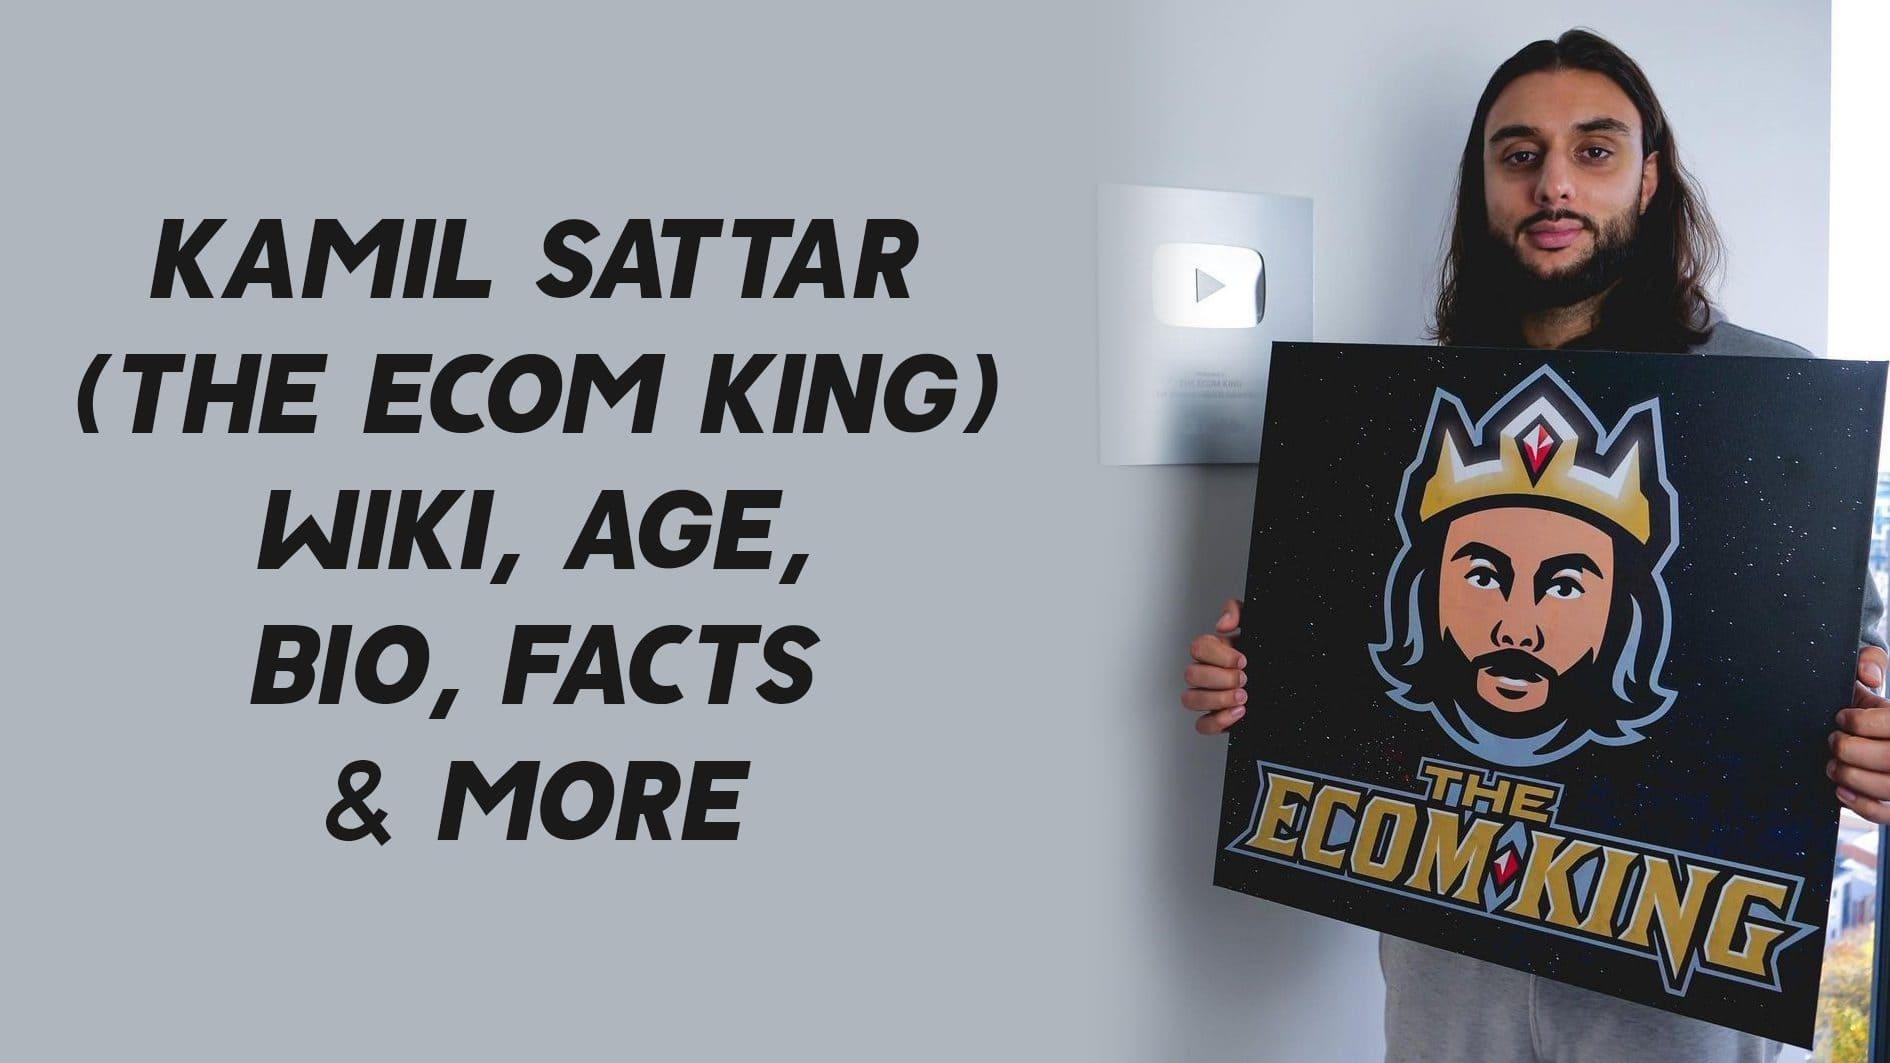 Kamil Sattar (The Ecom King) Wiki, Age, Bio, Facts & More 1